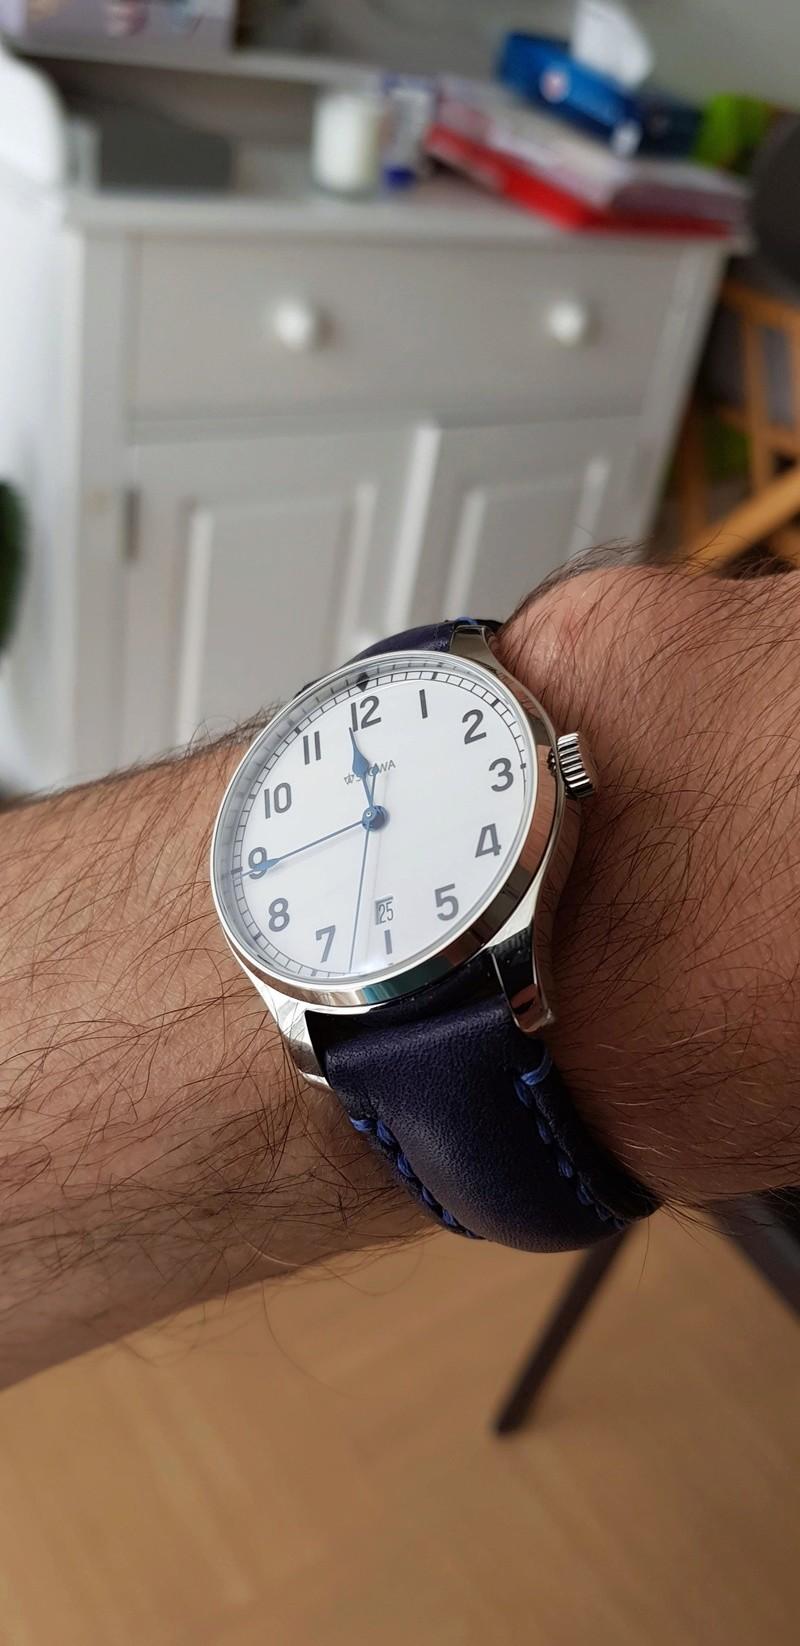 stowa - Présentation de ma montre de mariage - Stowa Stowa810